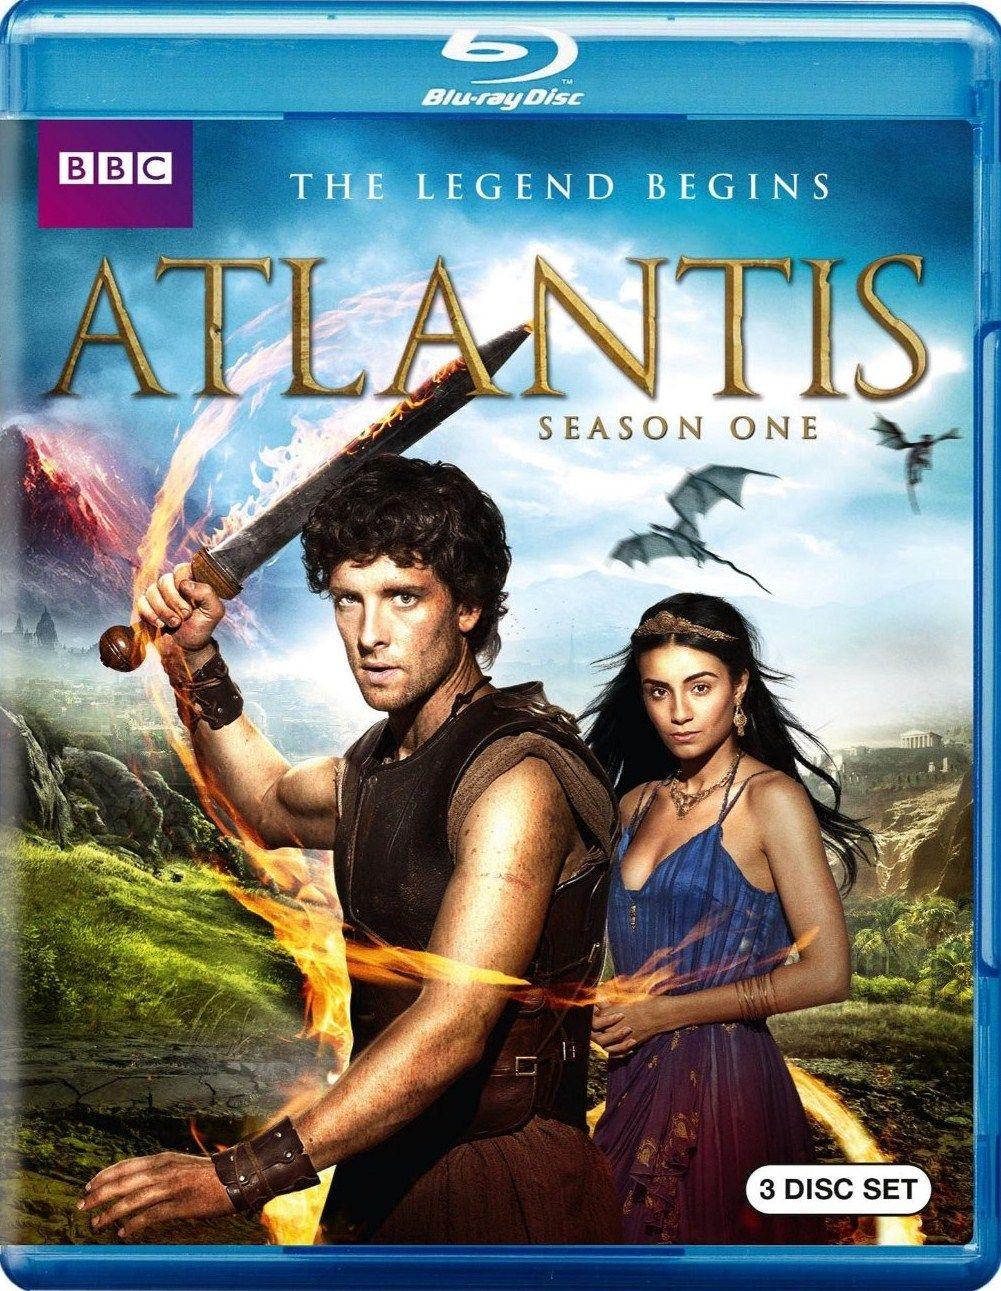 Atlantis Season One (2013) Bluray Review Let's Get